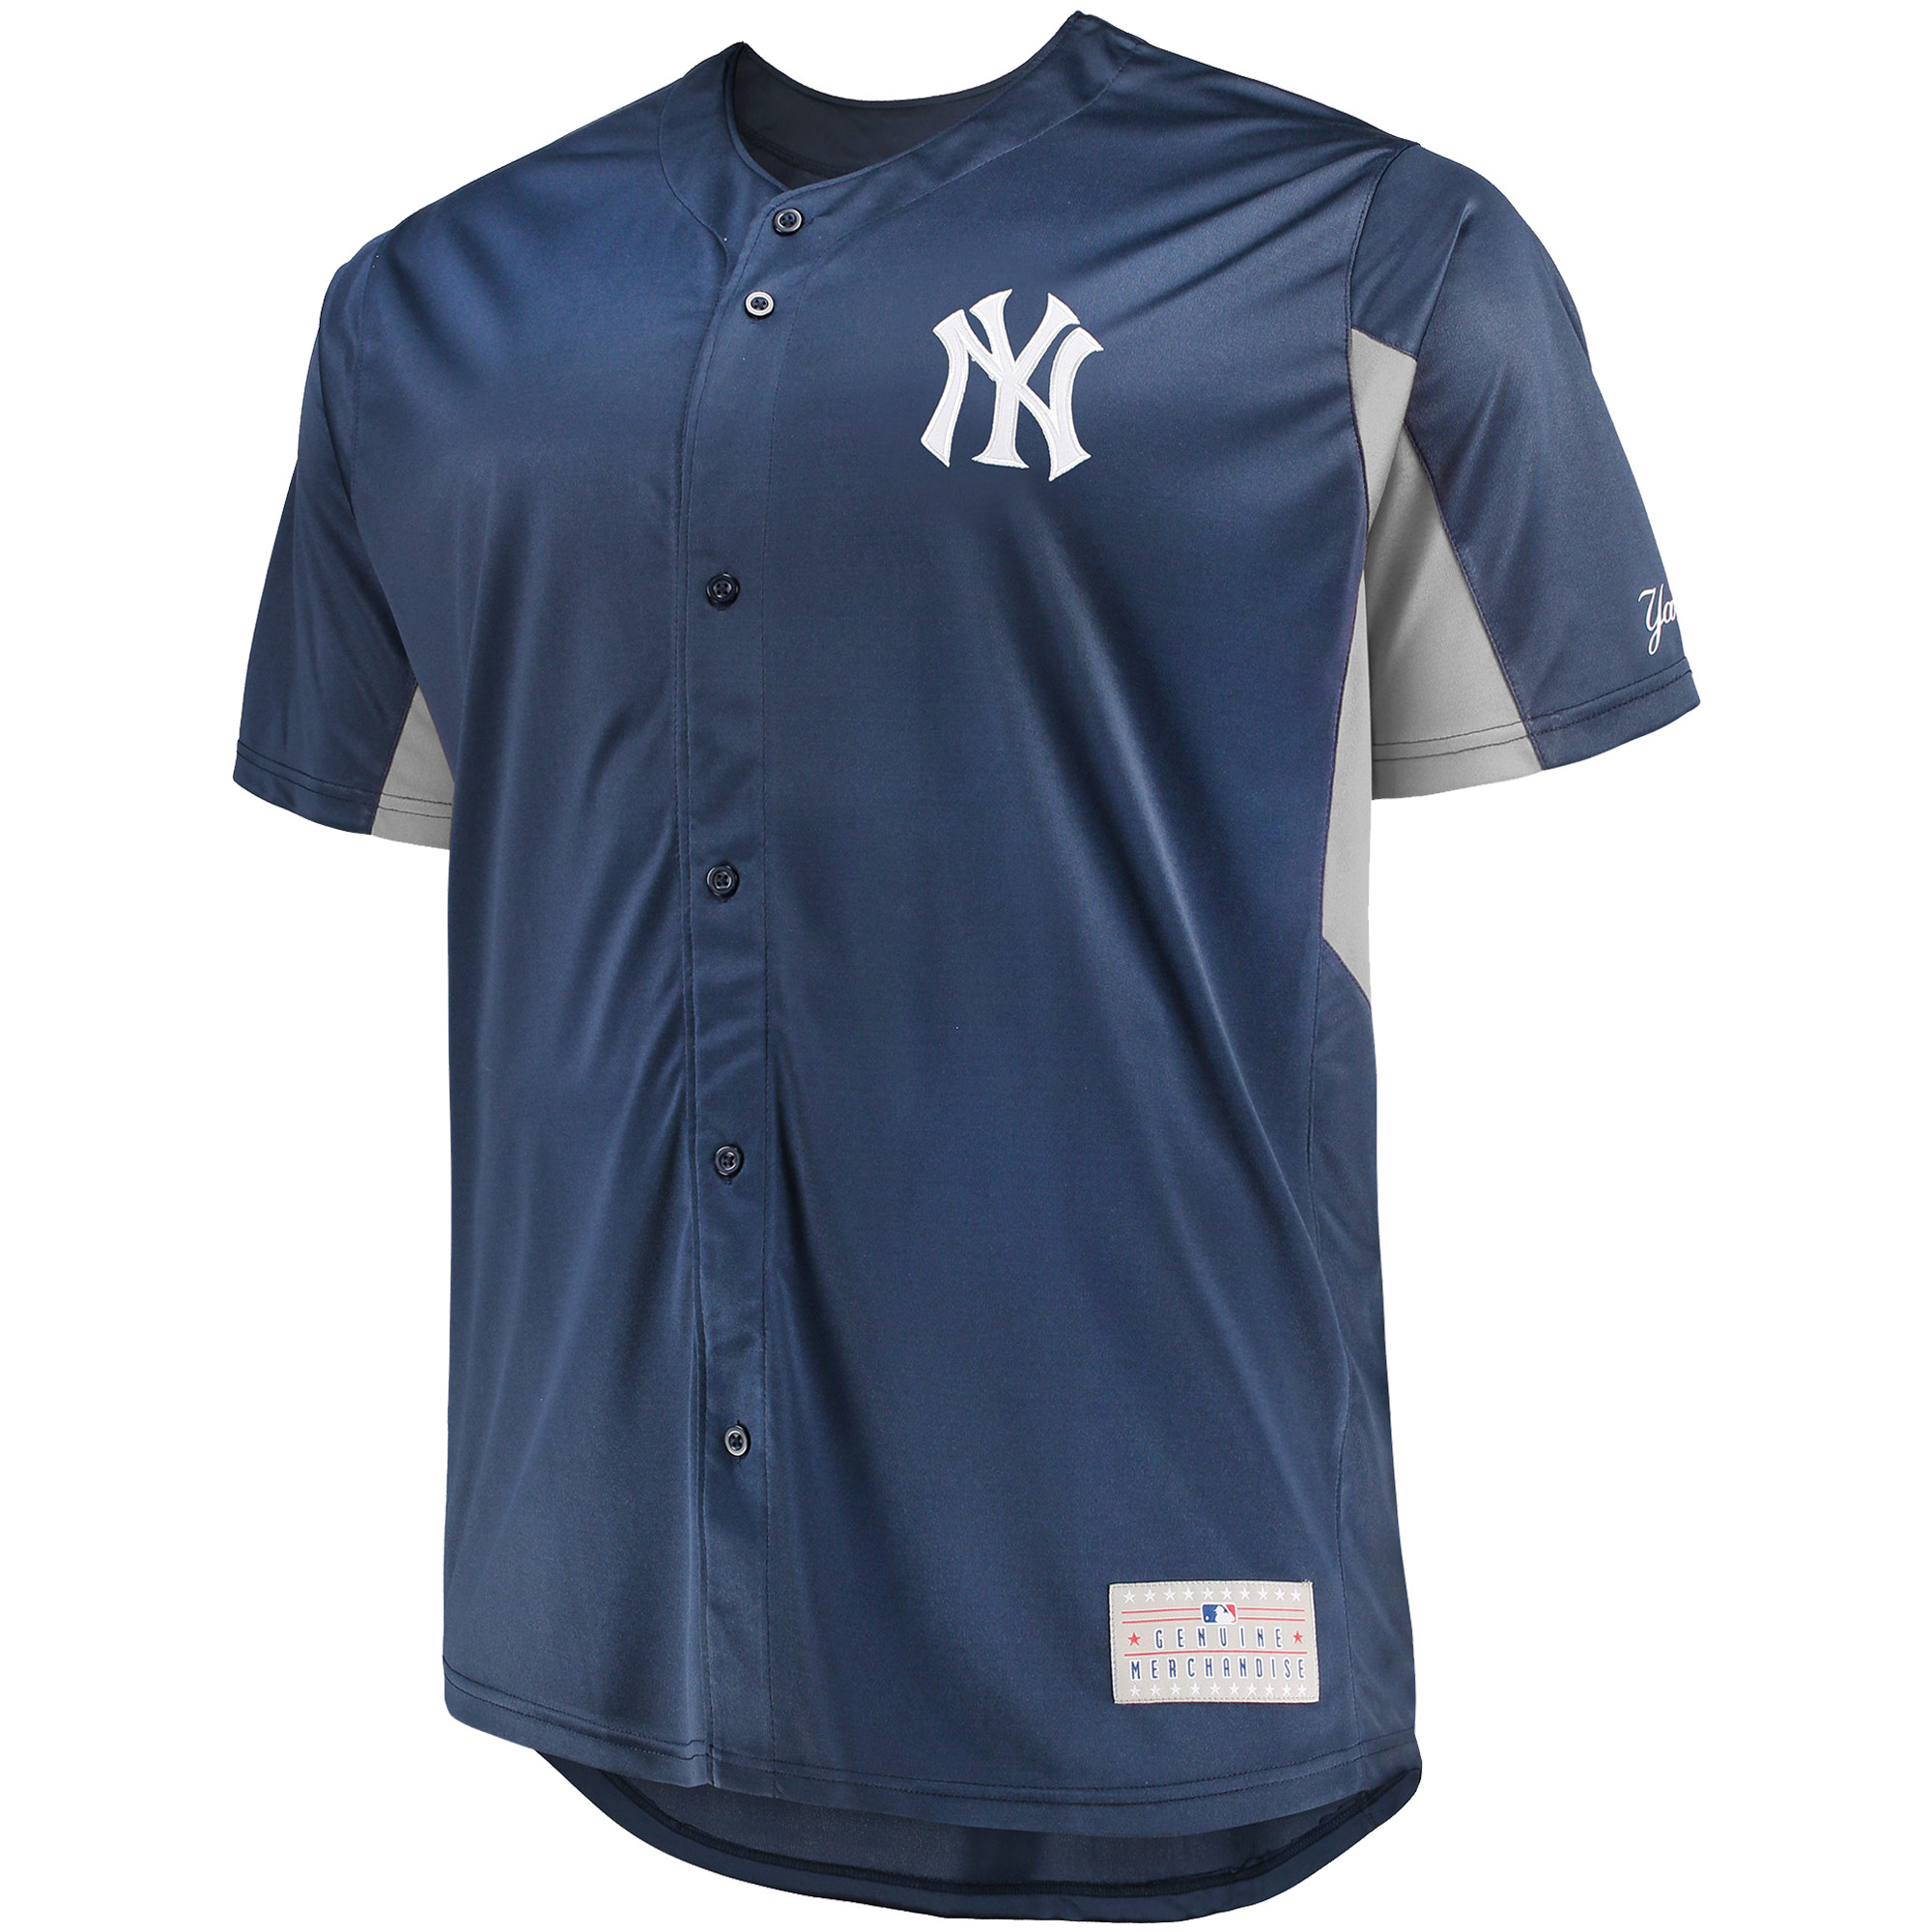 the best attitude 99644 35418 Aaron Judge New York Yankees Majestic MLB Jersey - Navy